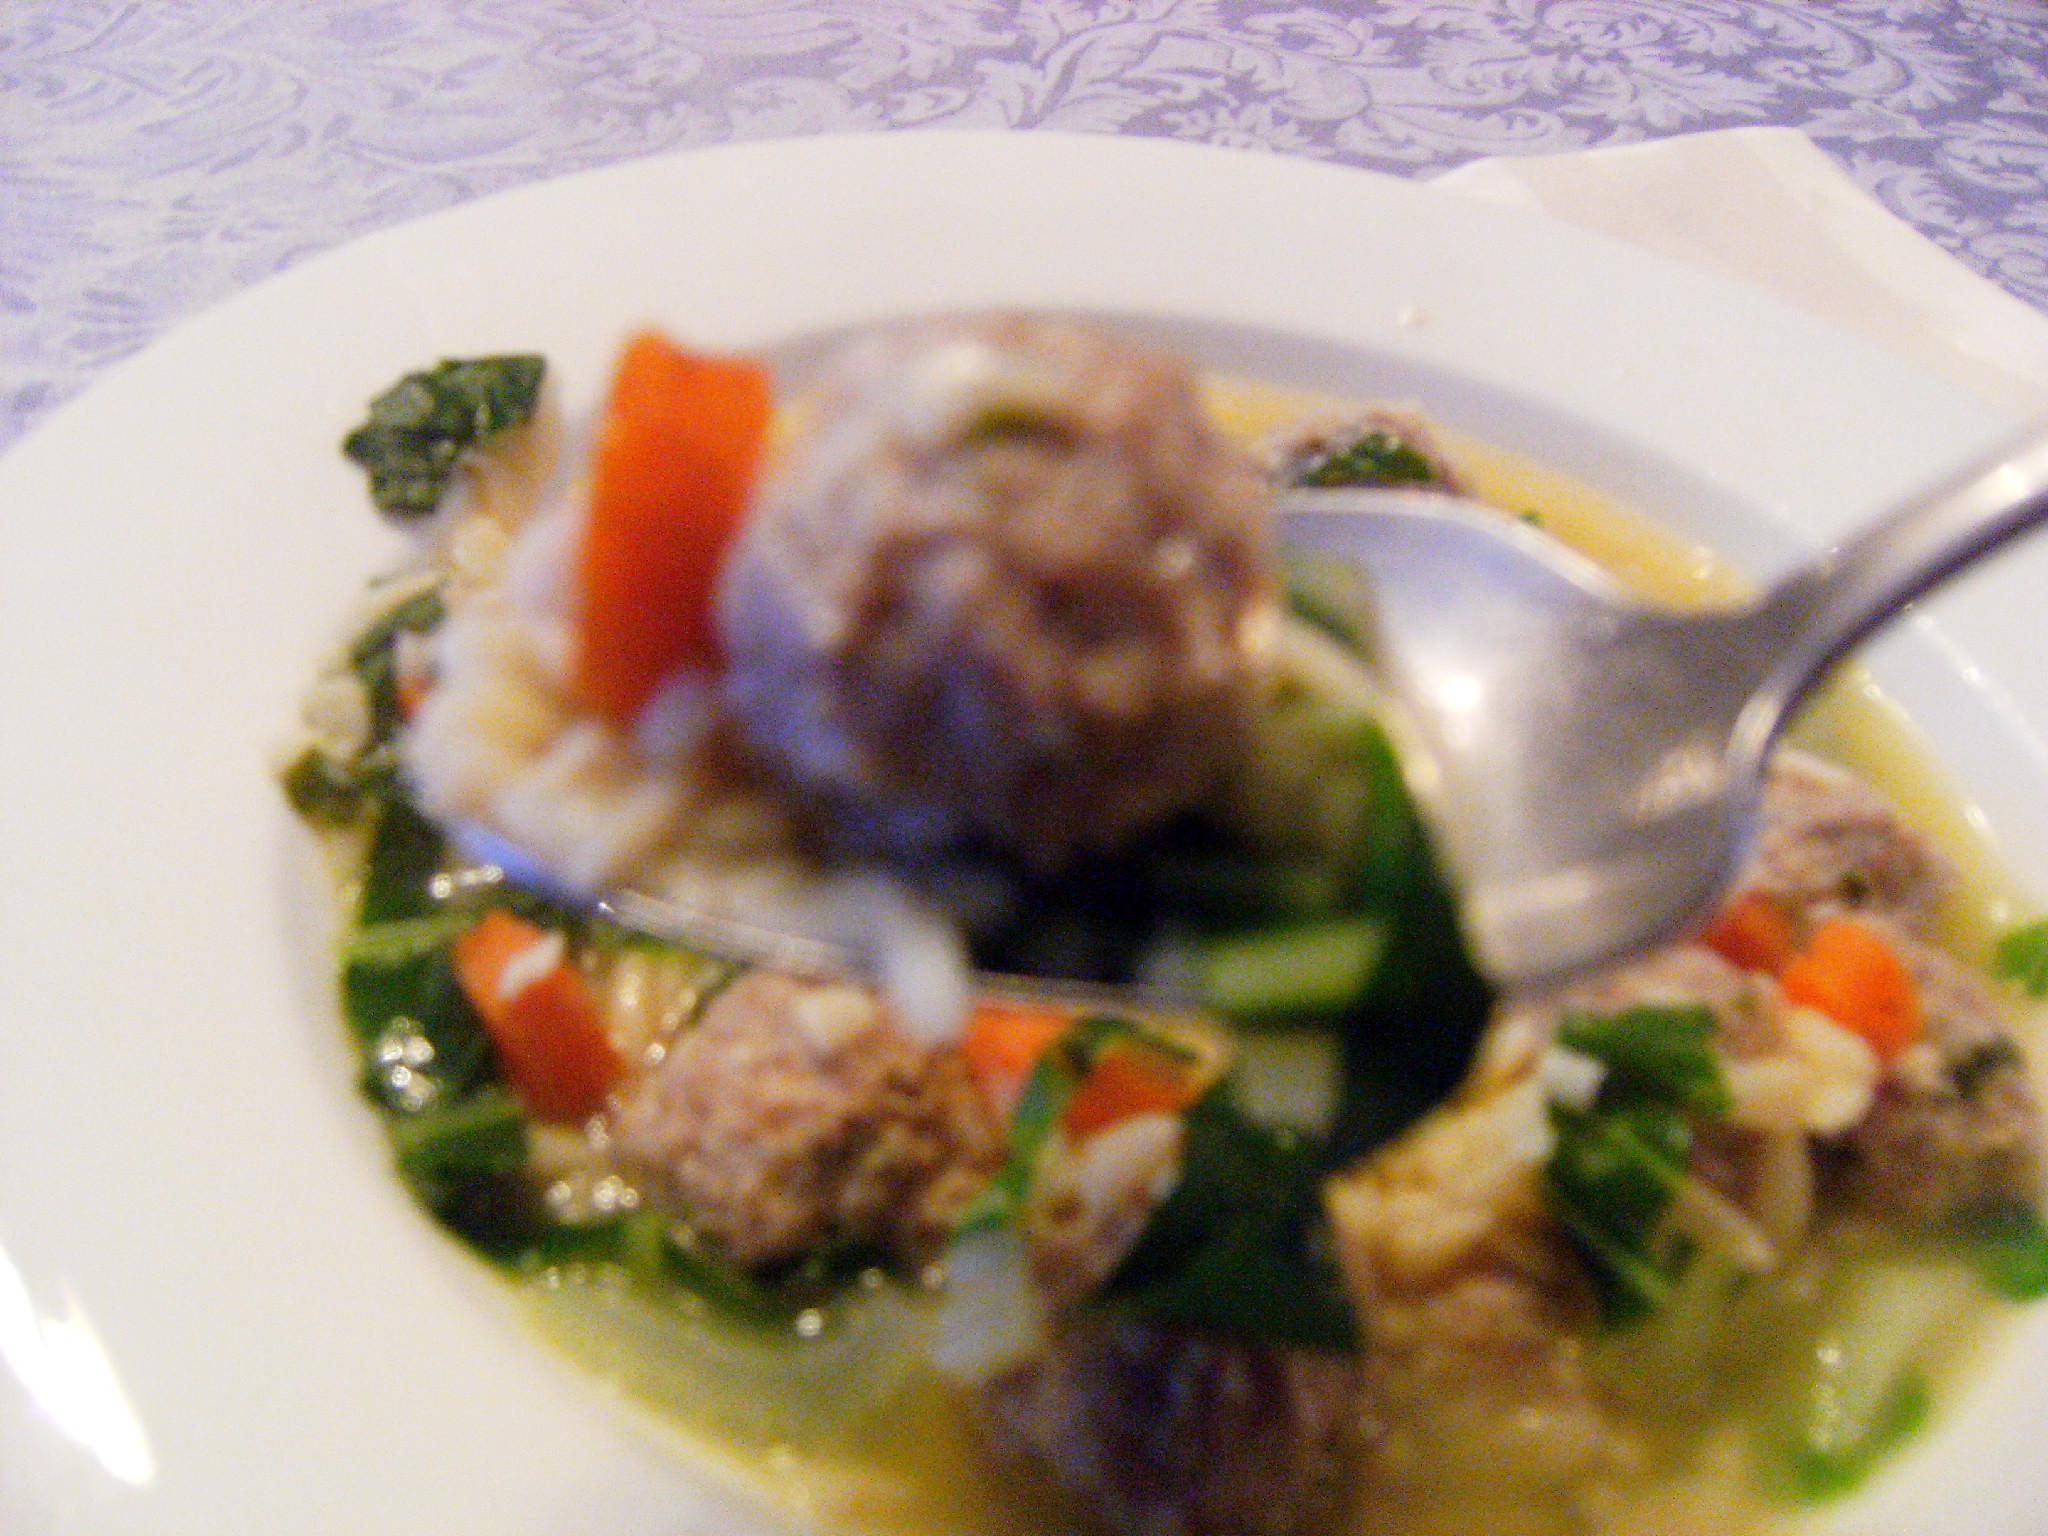 A bowl of turkey meatball soup